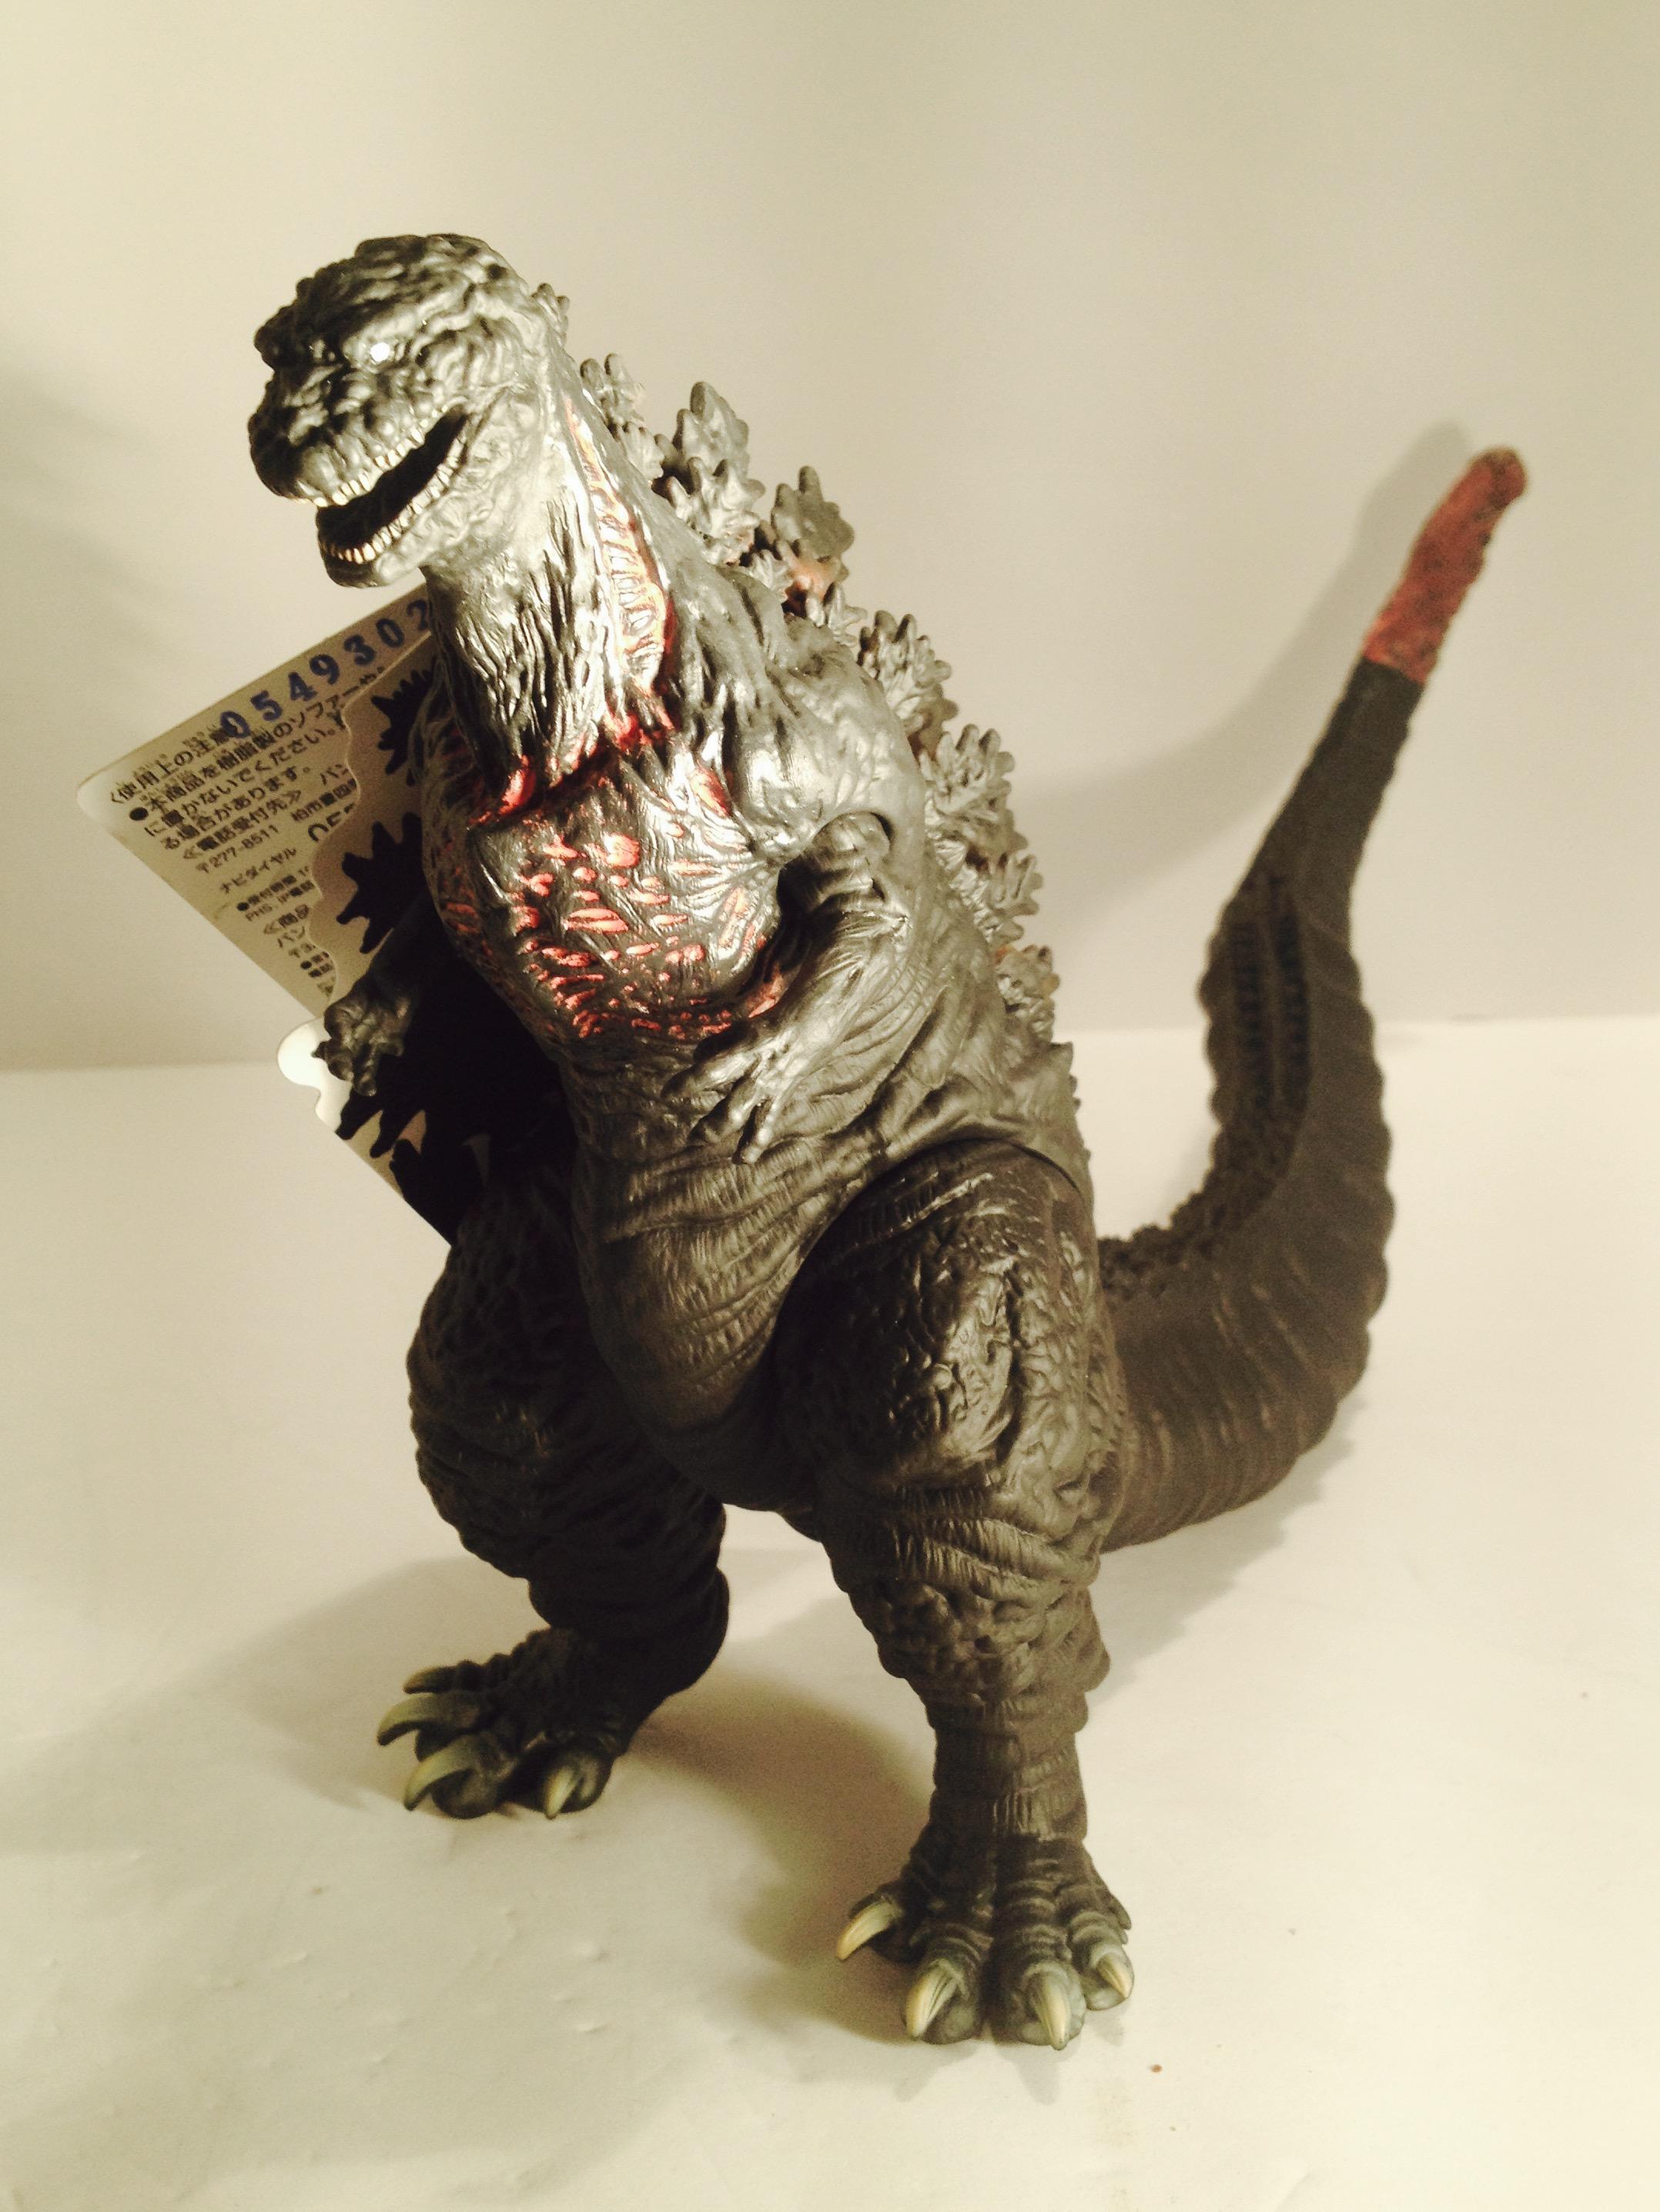 Shin Godzilla Bandai 6 Inch Vinyl Figure Toy Clawmark Toys